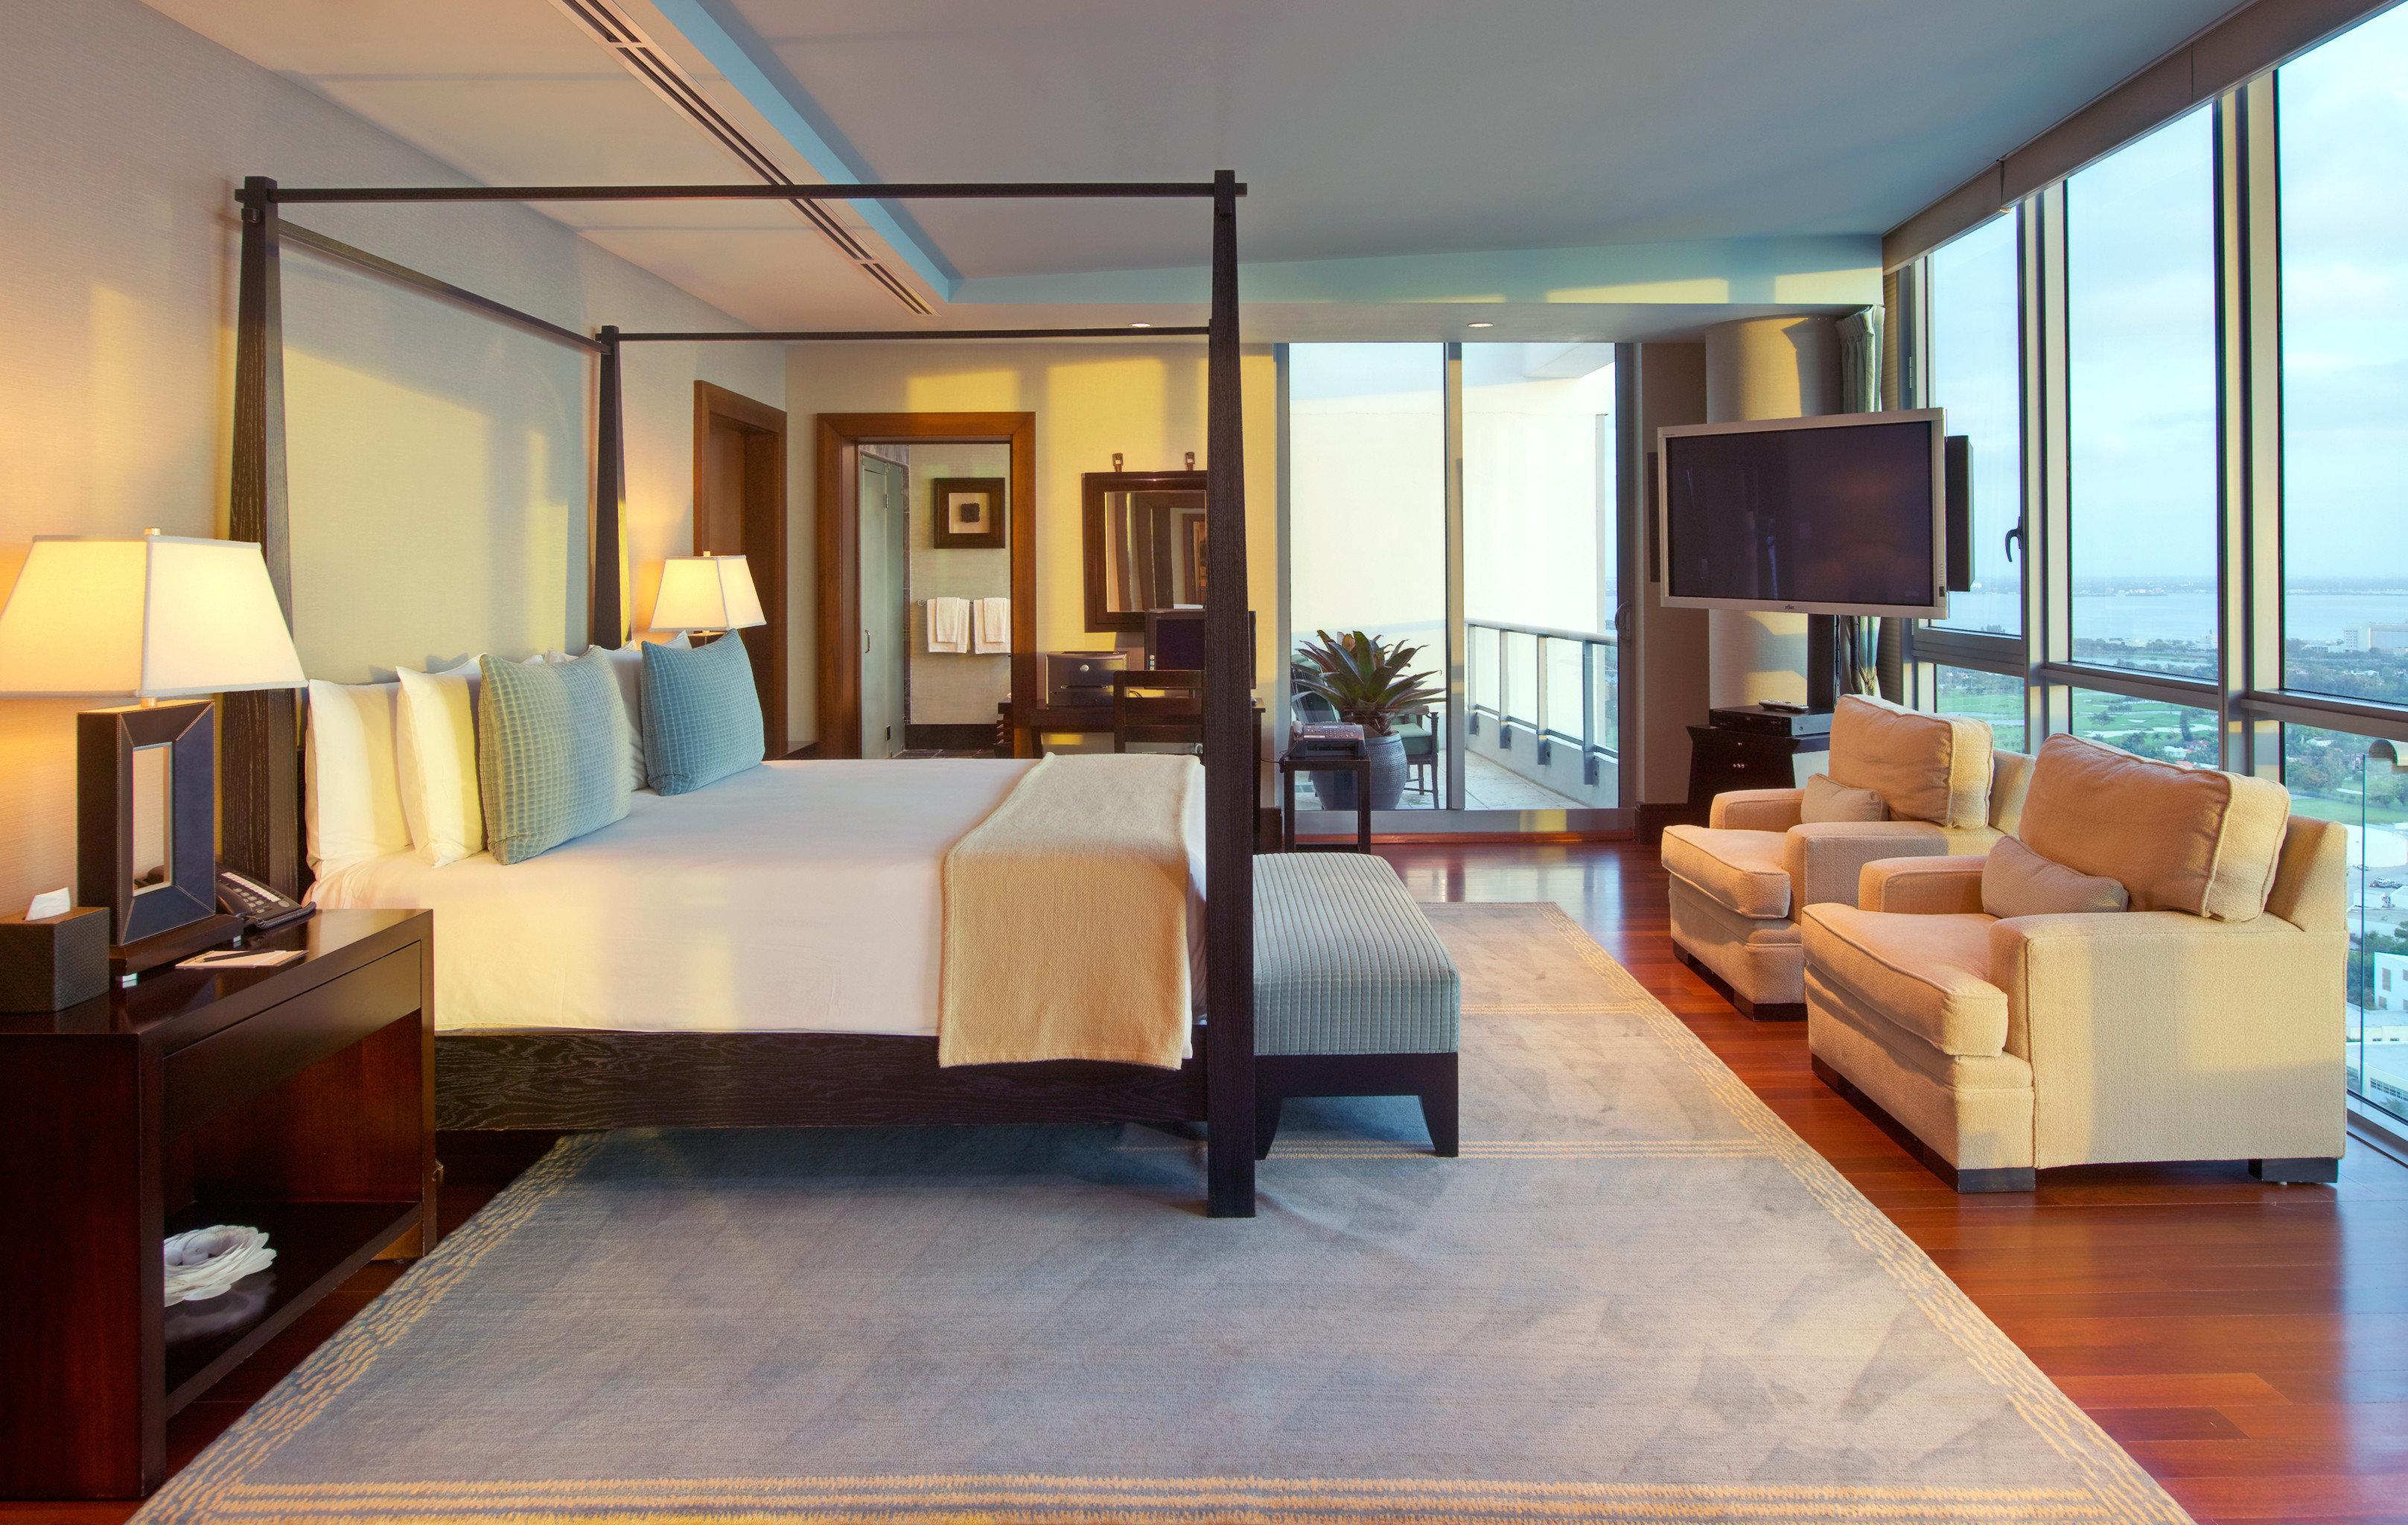 Bedroom Elegant Luxury Modern Scenic views Suite property living room condominium hardwood home Villa Resort yacht mansion flat